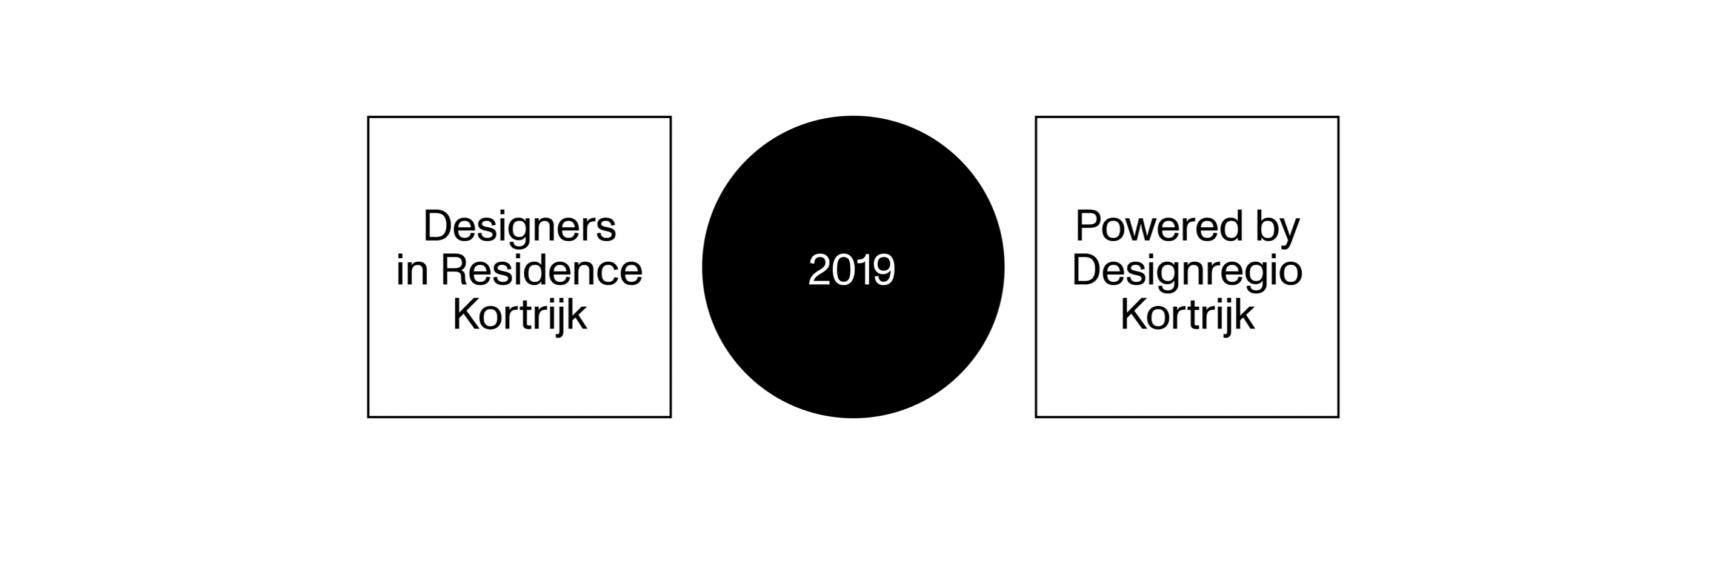 Designers in residence 2019